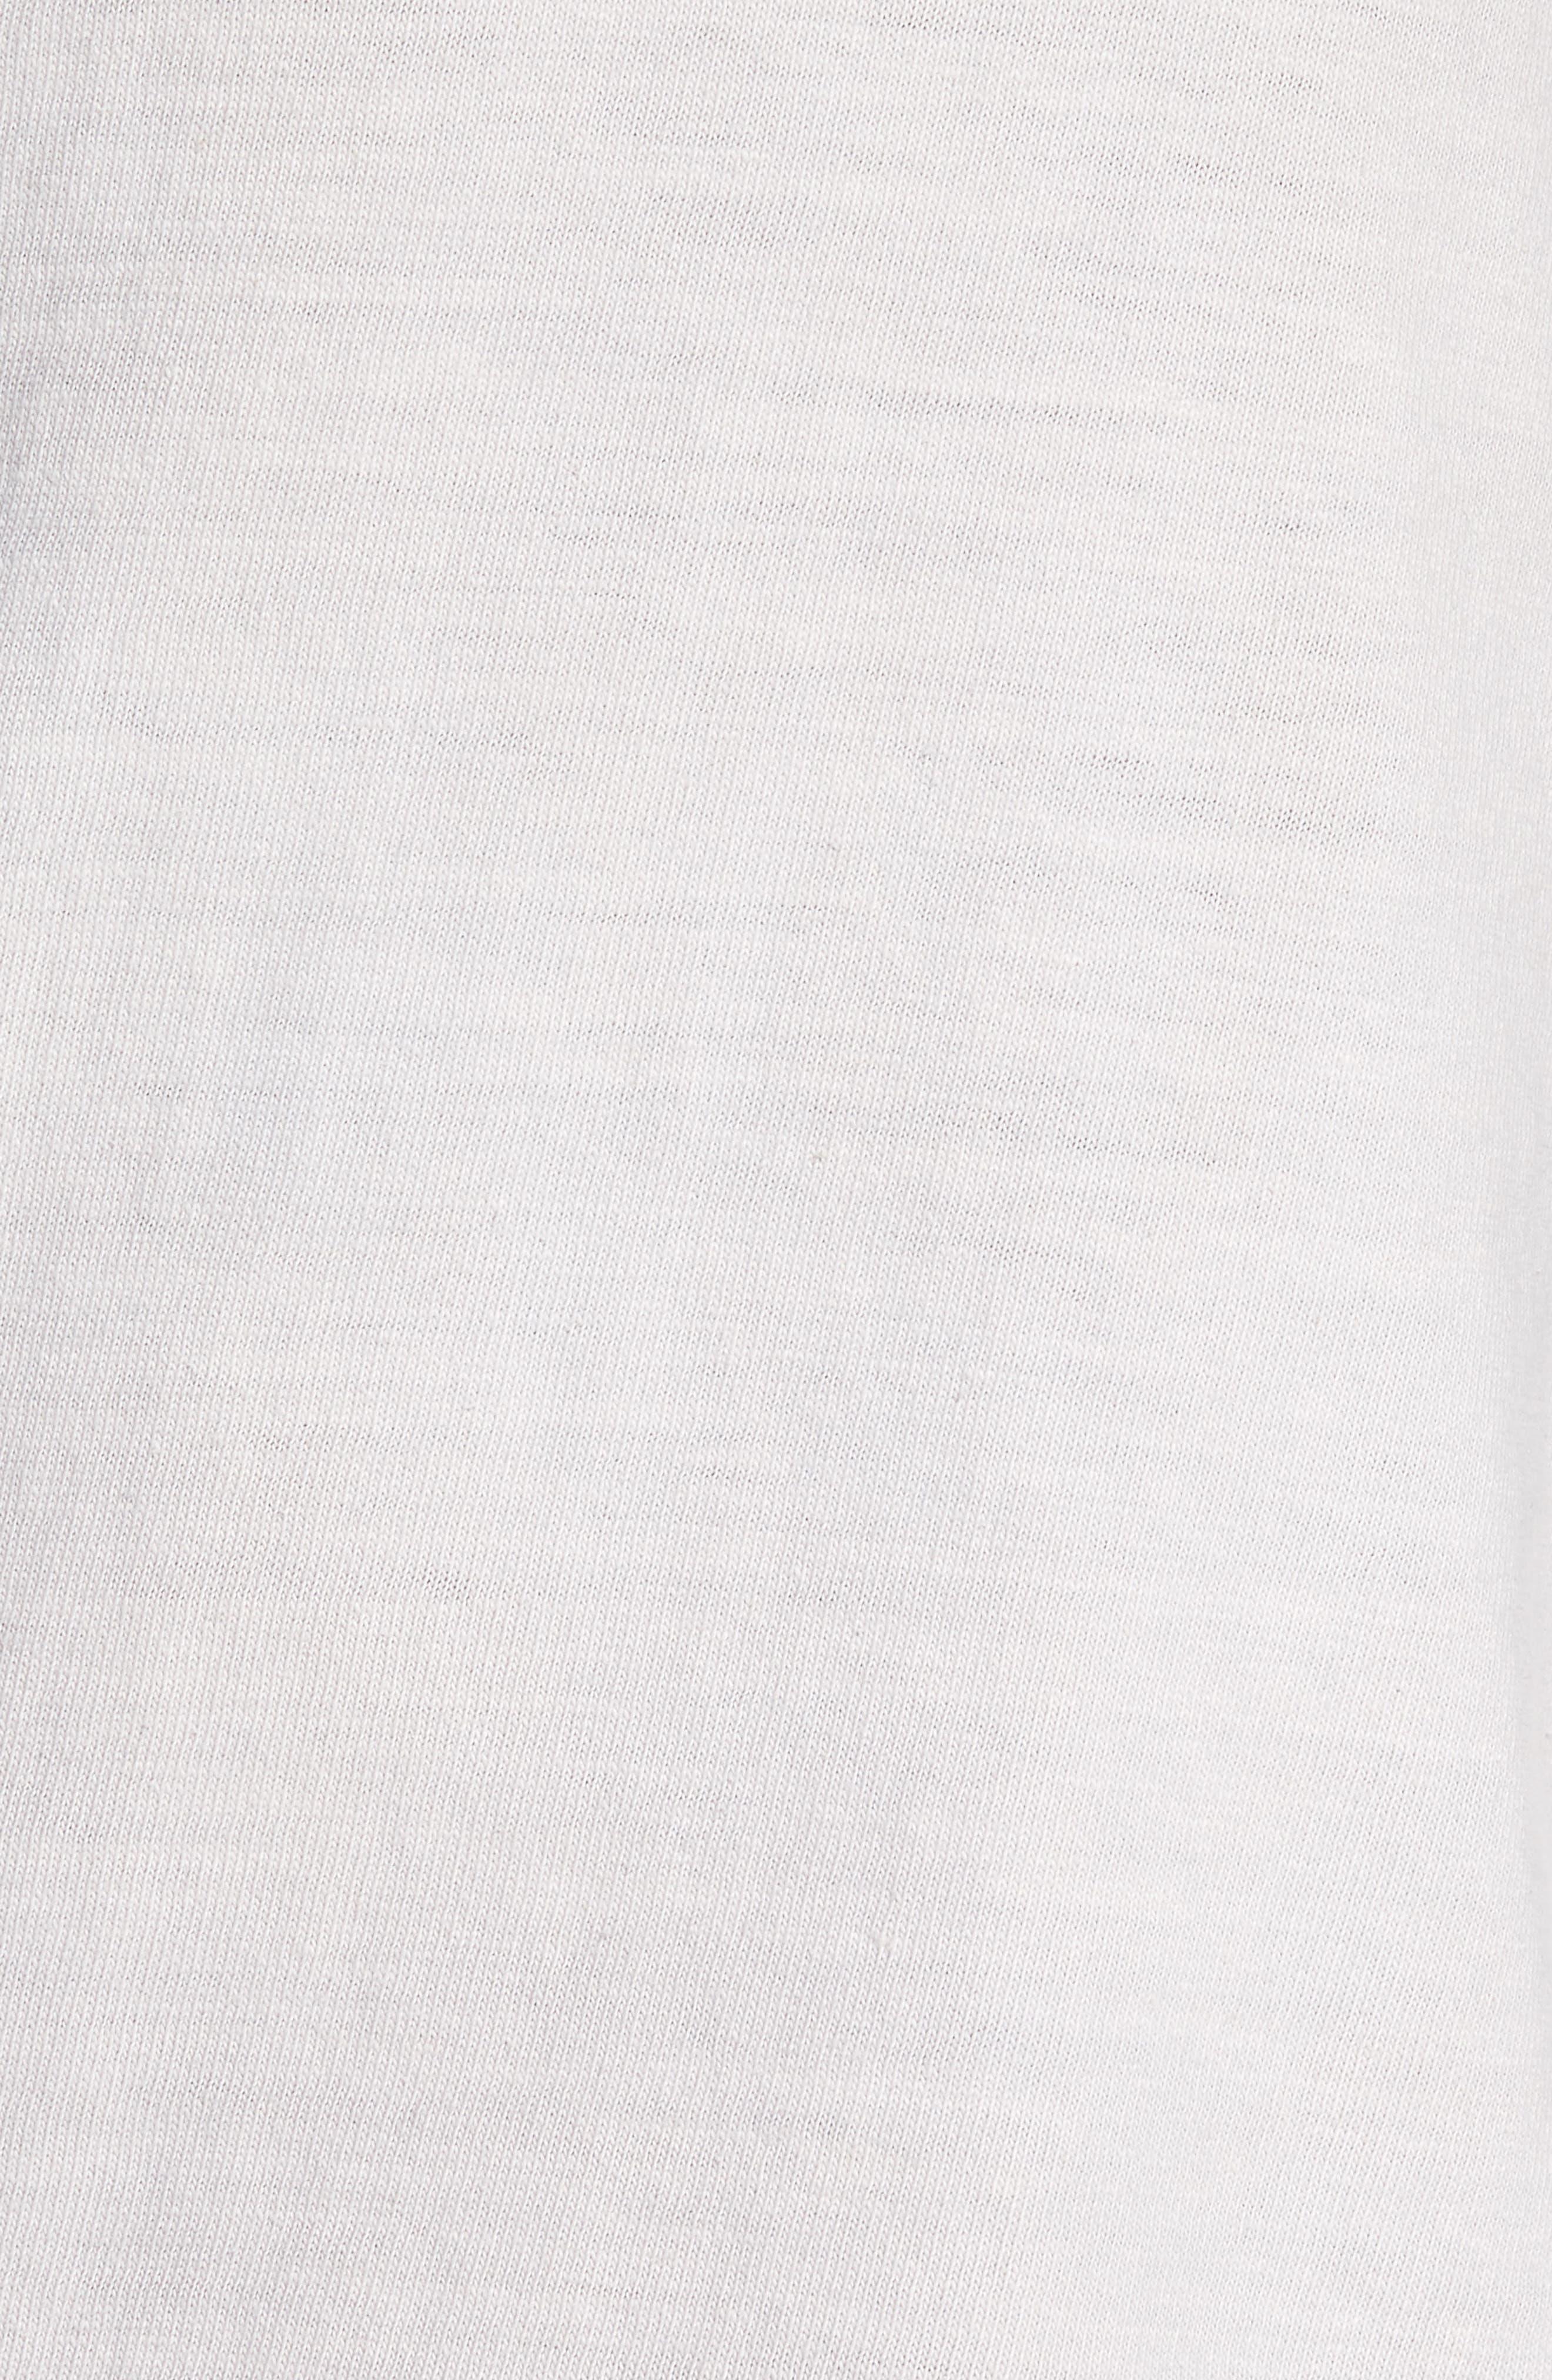 Standard Fit Pullover Hoodie,                             Alternate thumbnail 5, color,                             Concrete Dust Pigment